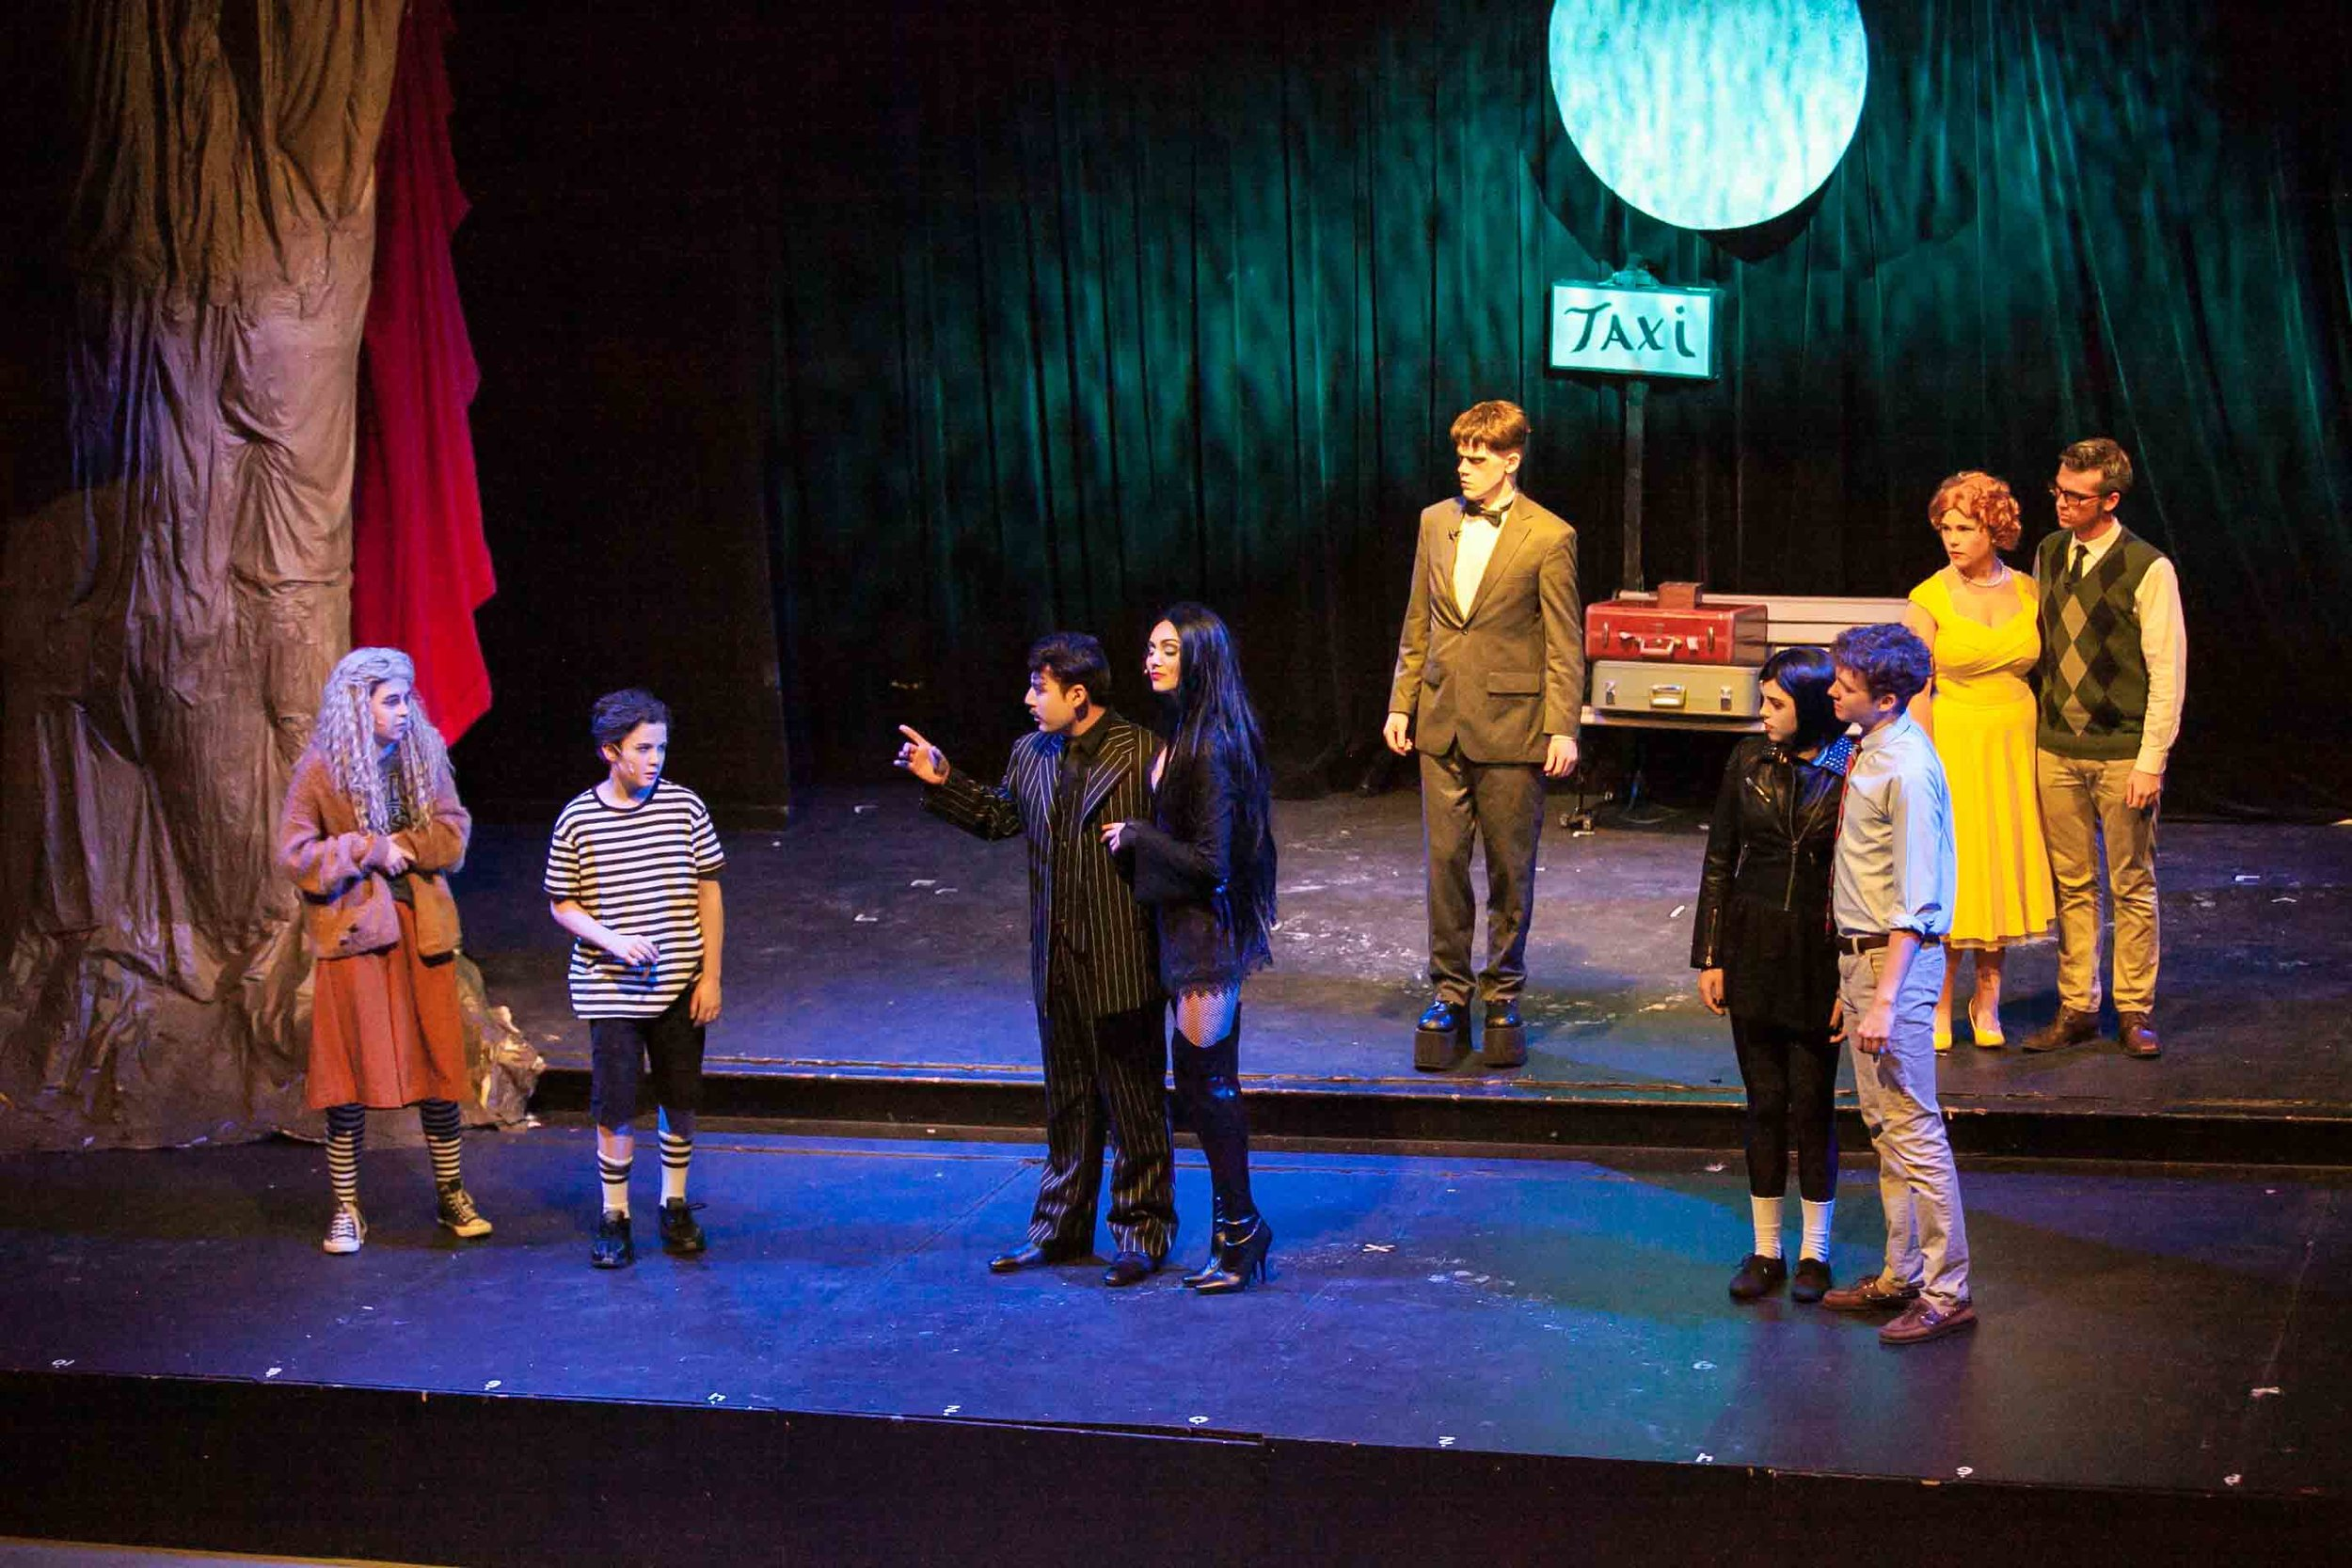 6-19-16 Addams Family Kooky Cast 0411.jpg